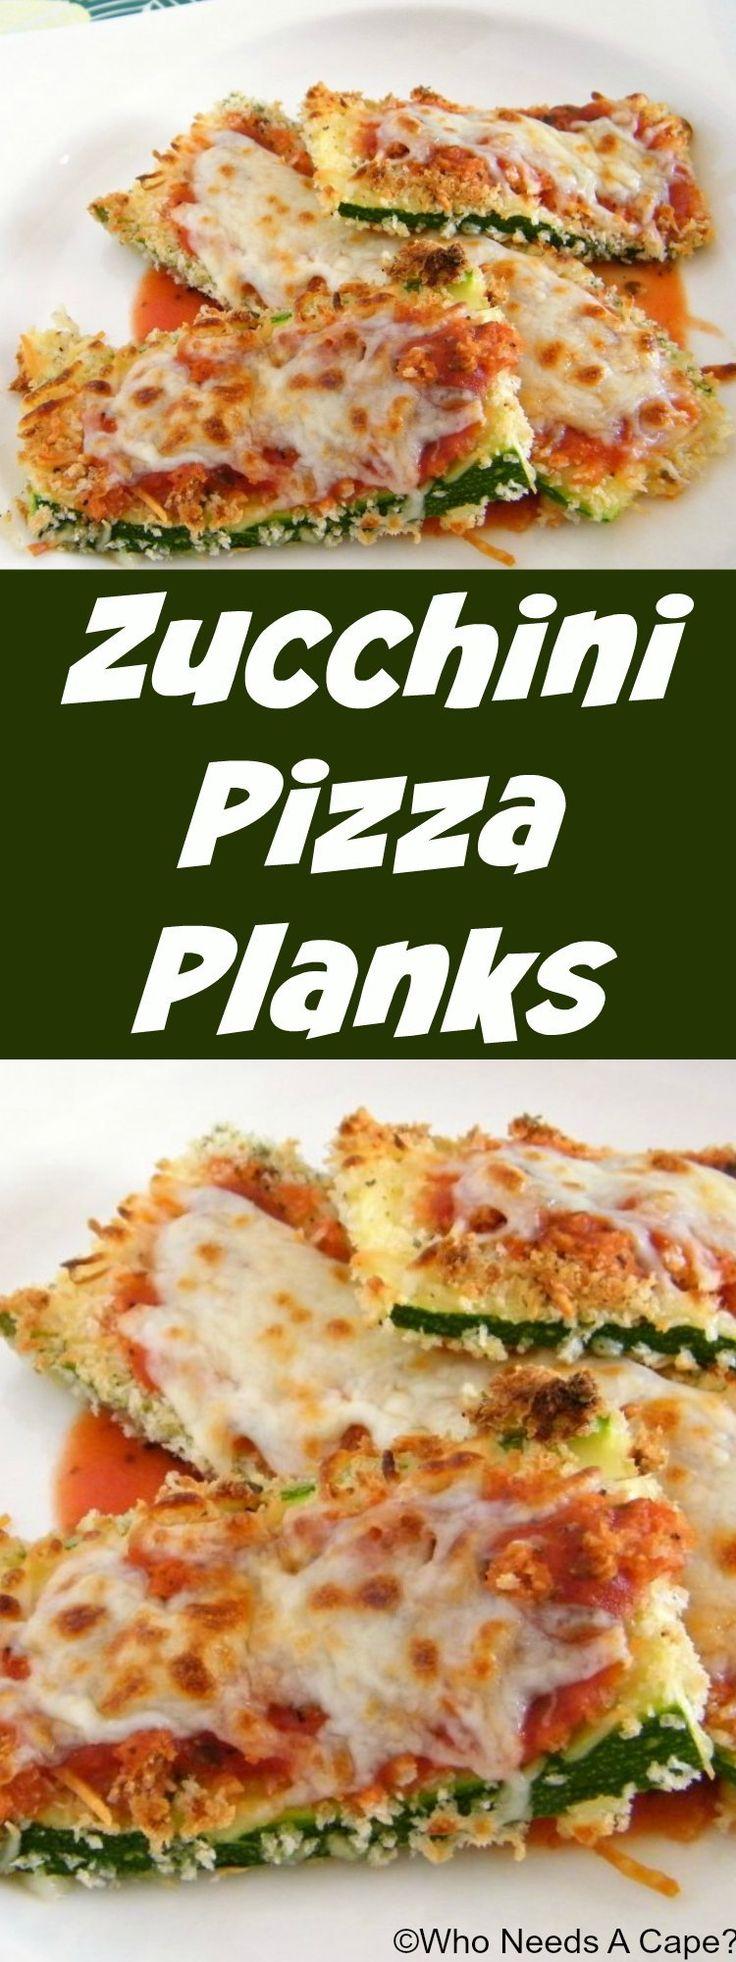 Zucchini Pizza Planks   Who Needs A Cape?